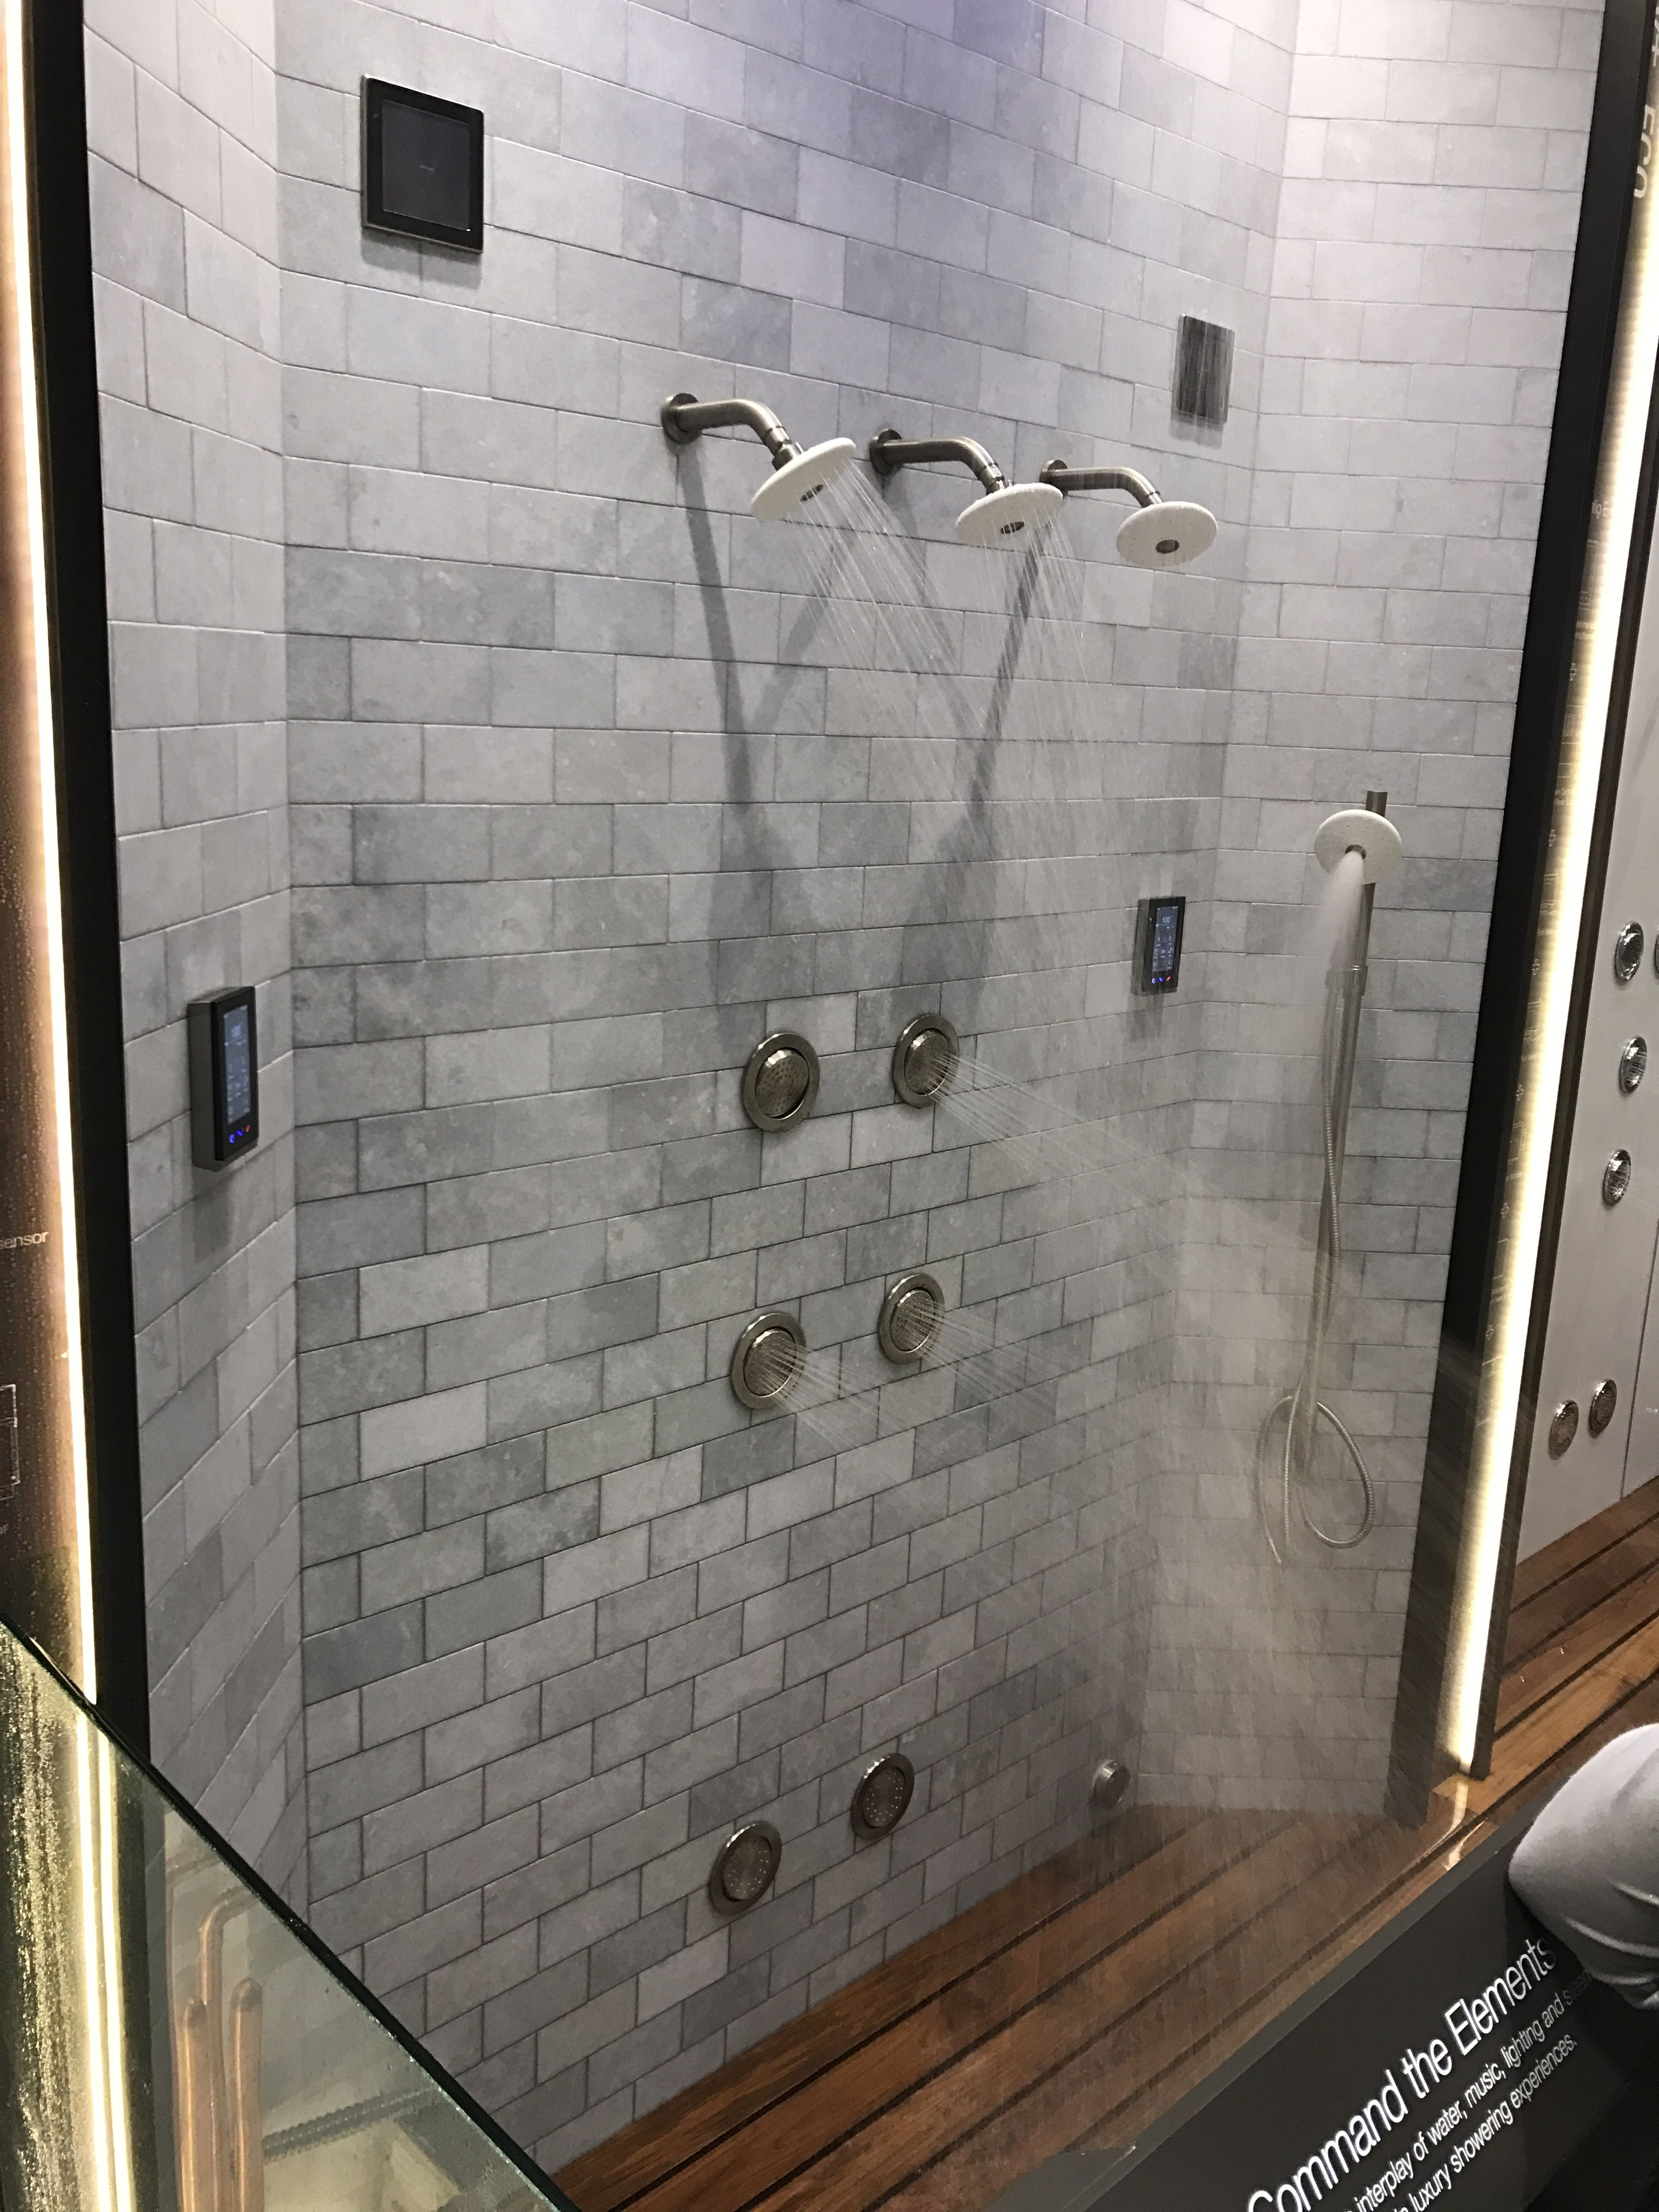 Pin By Bethany Wesco On Future Home Ideas Bathrooms Bathroom Bathtub Home